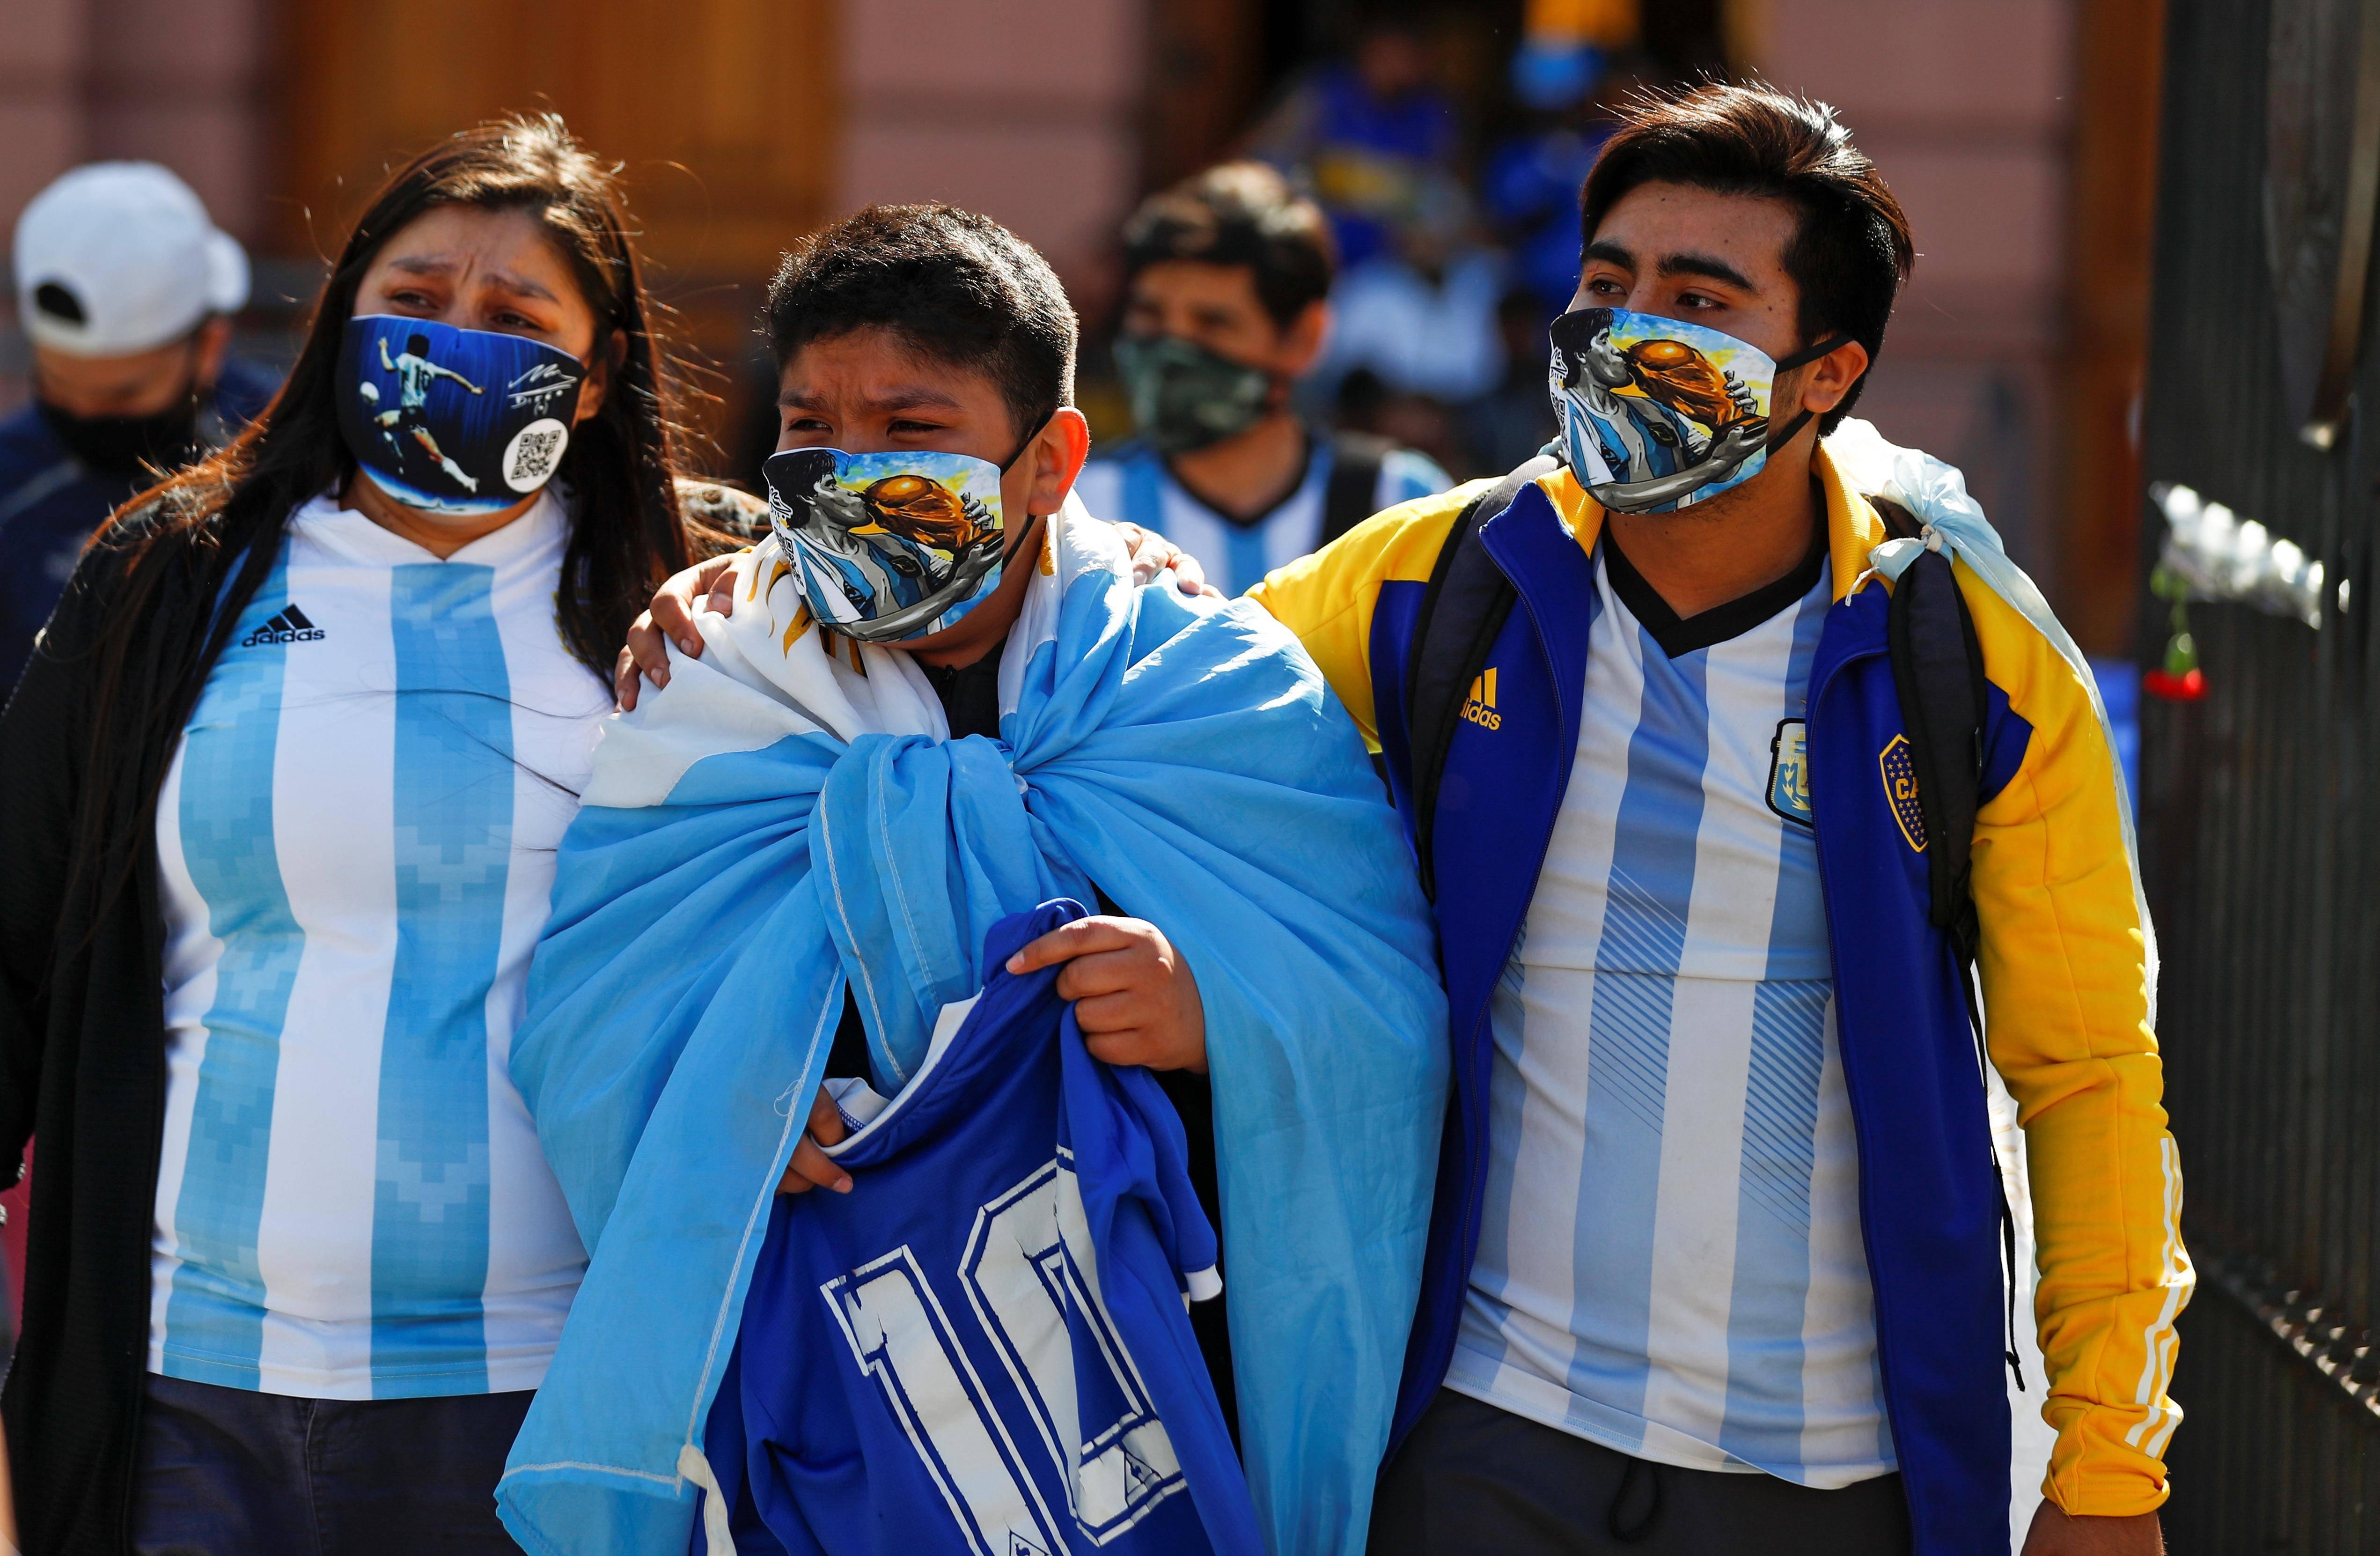 Argentines mourn football hero Maradona as family seeks quick burial